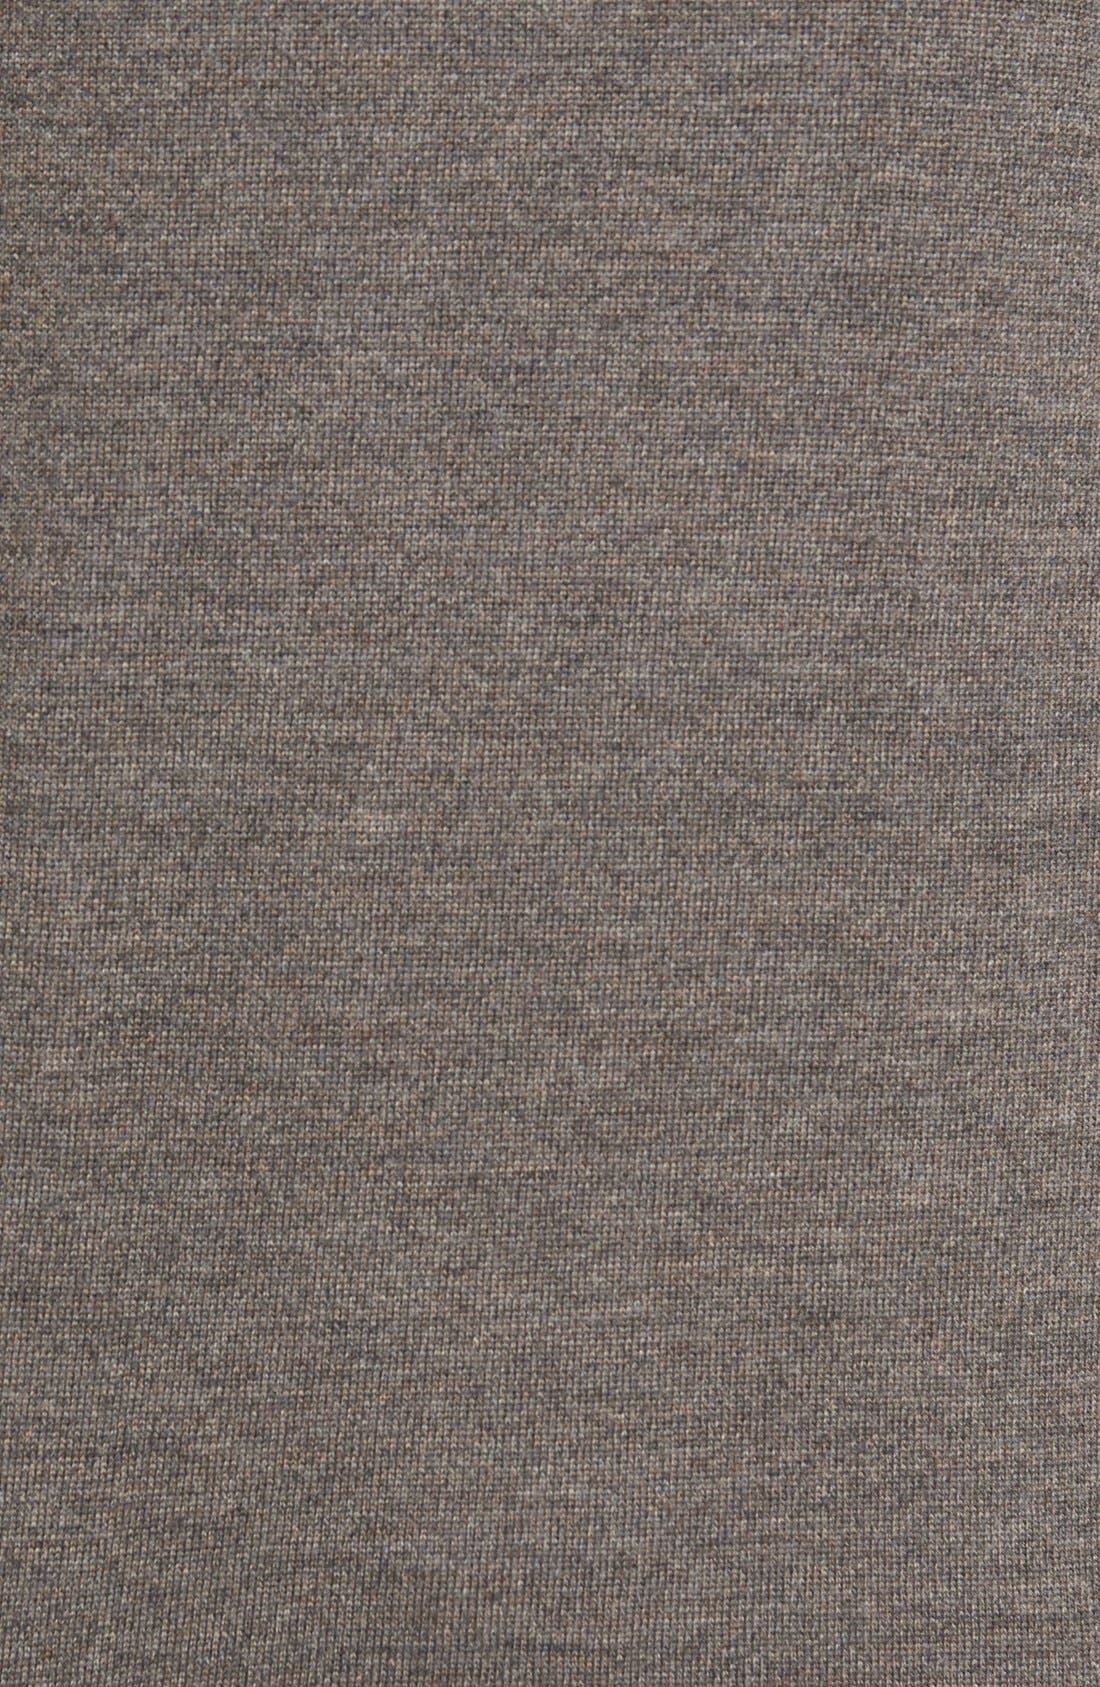 'Burwood Bay' Wool V-Neck Sweater,                             Alternate thumbnail 5, color,                             259